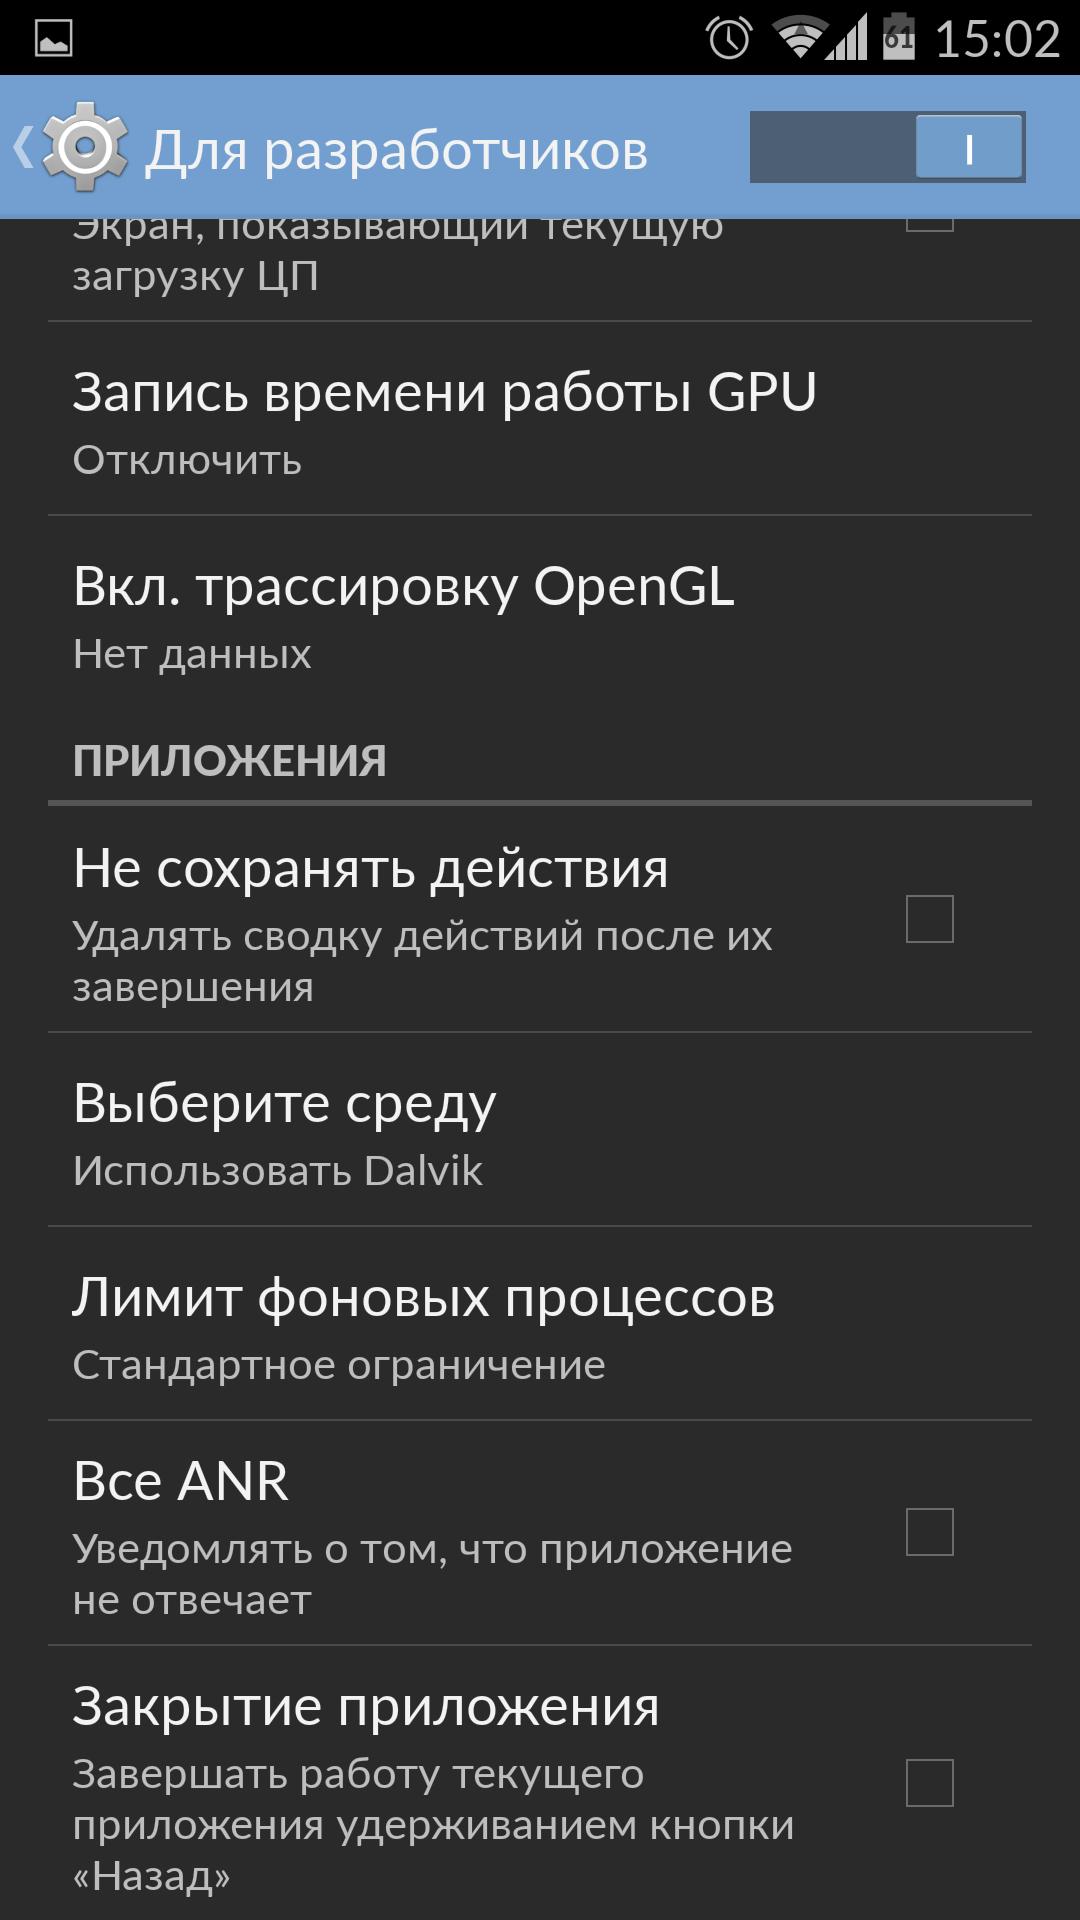 https://hd.zp.ua/wp-content/uploads/2015/08/2014-07-02-11-02-103.png